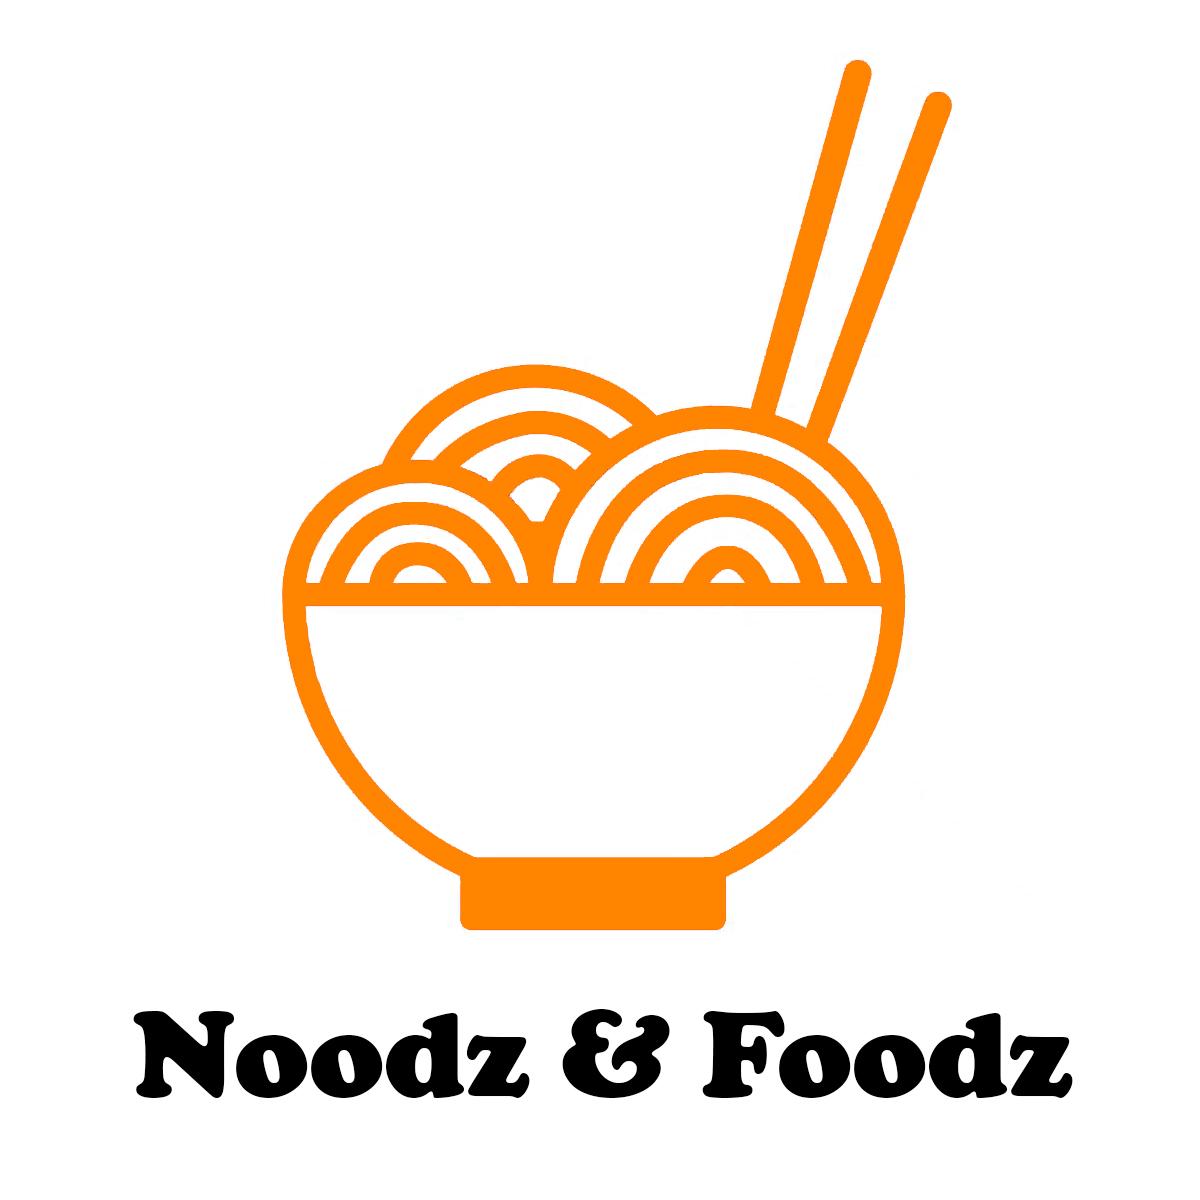 Noodz & Foodz